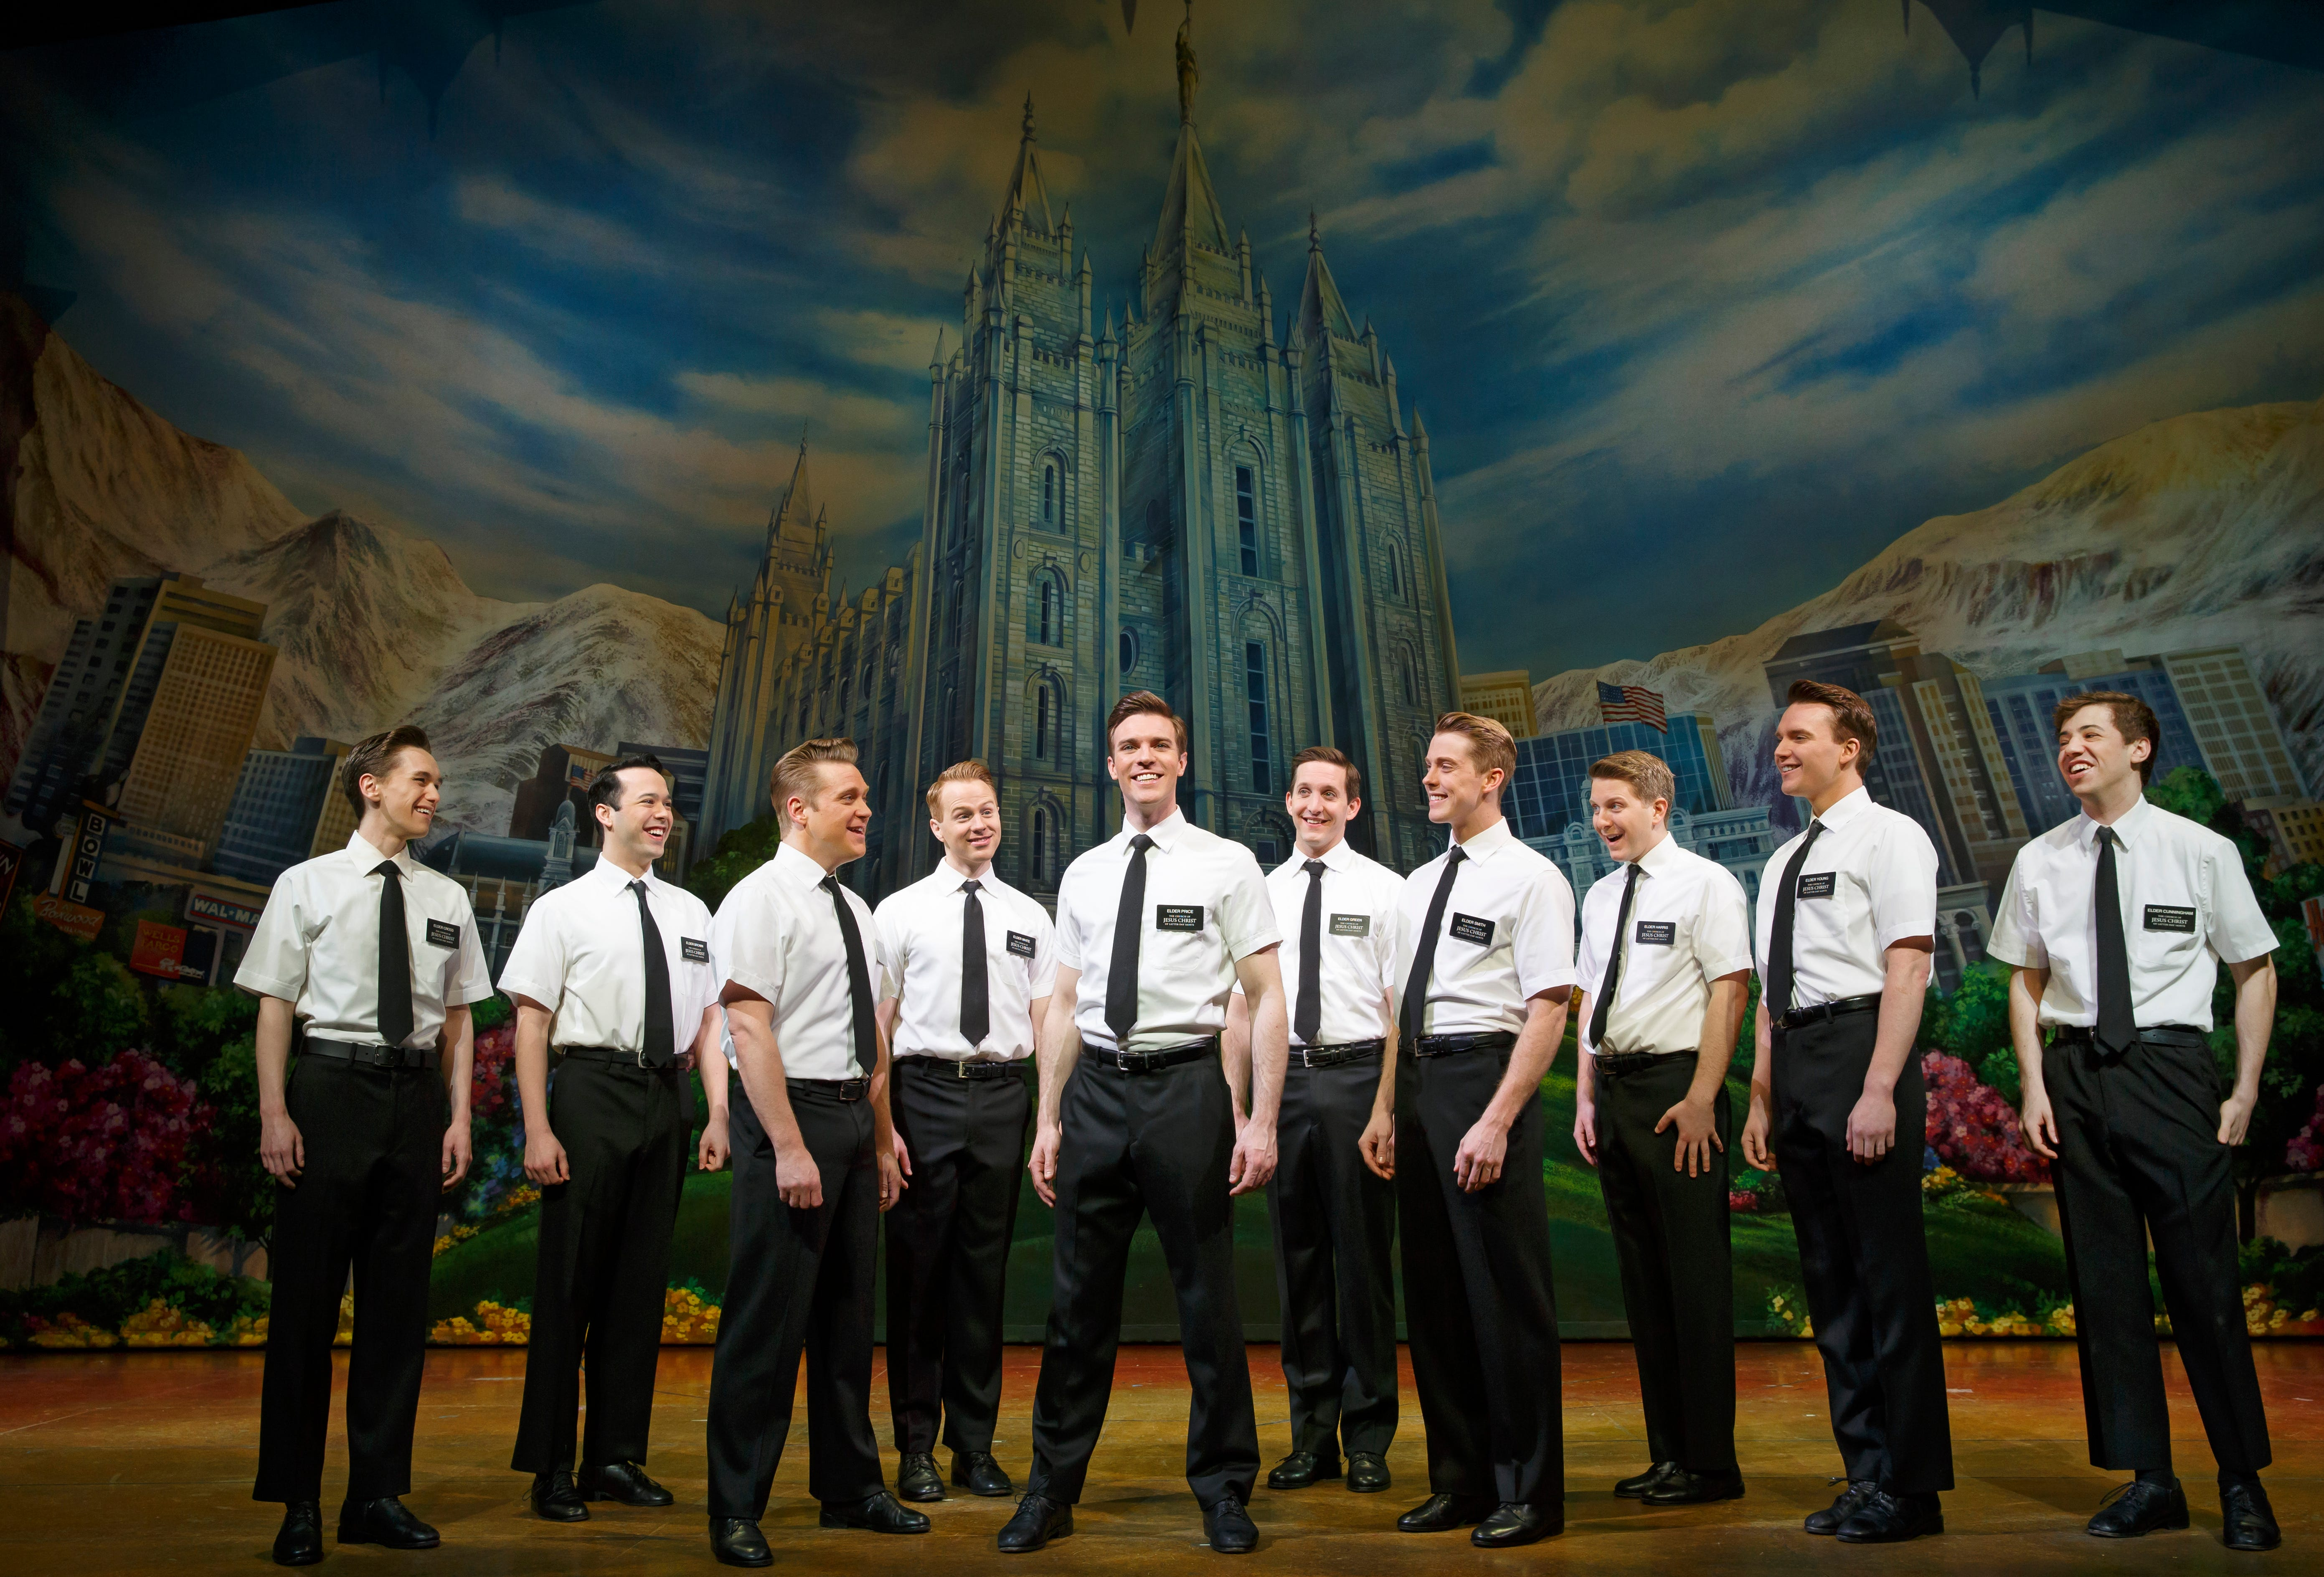 Nifty mormon missionary gay